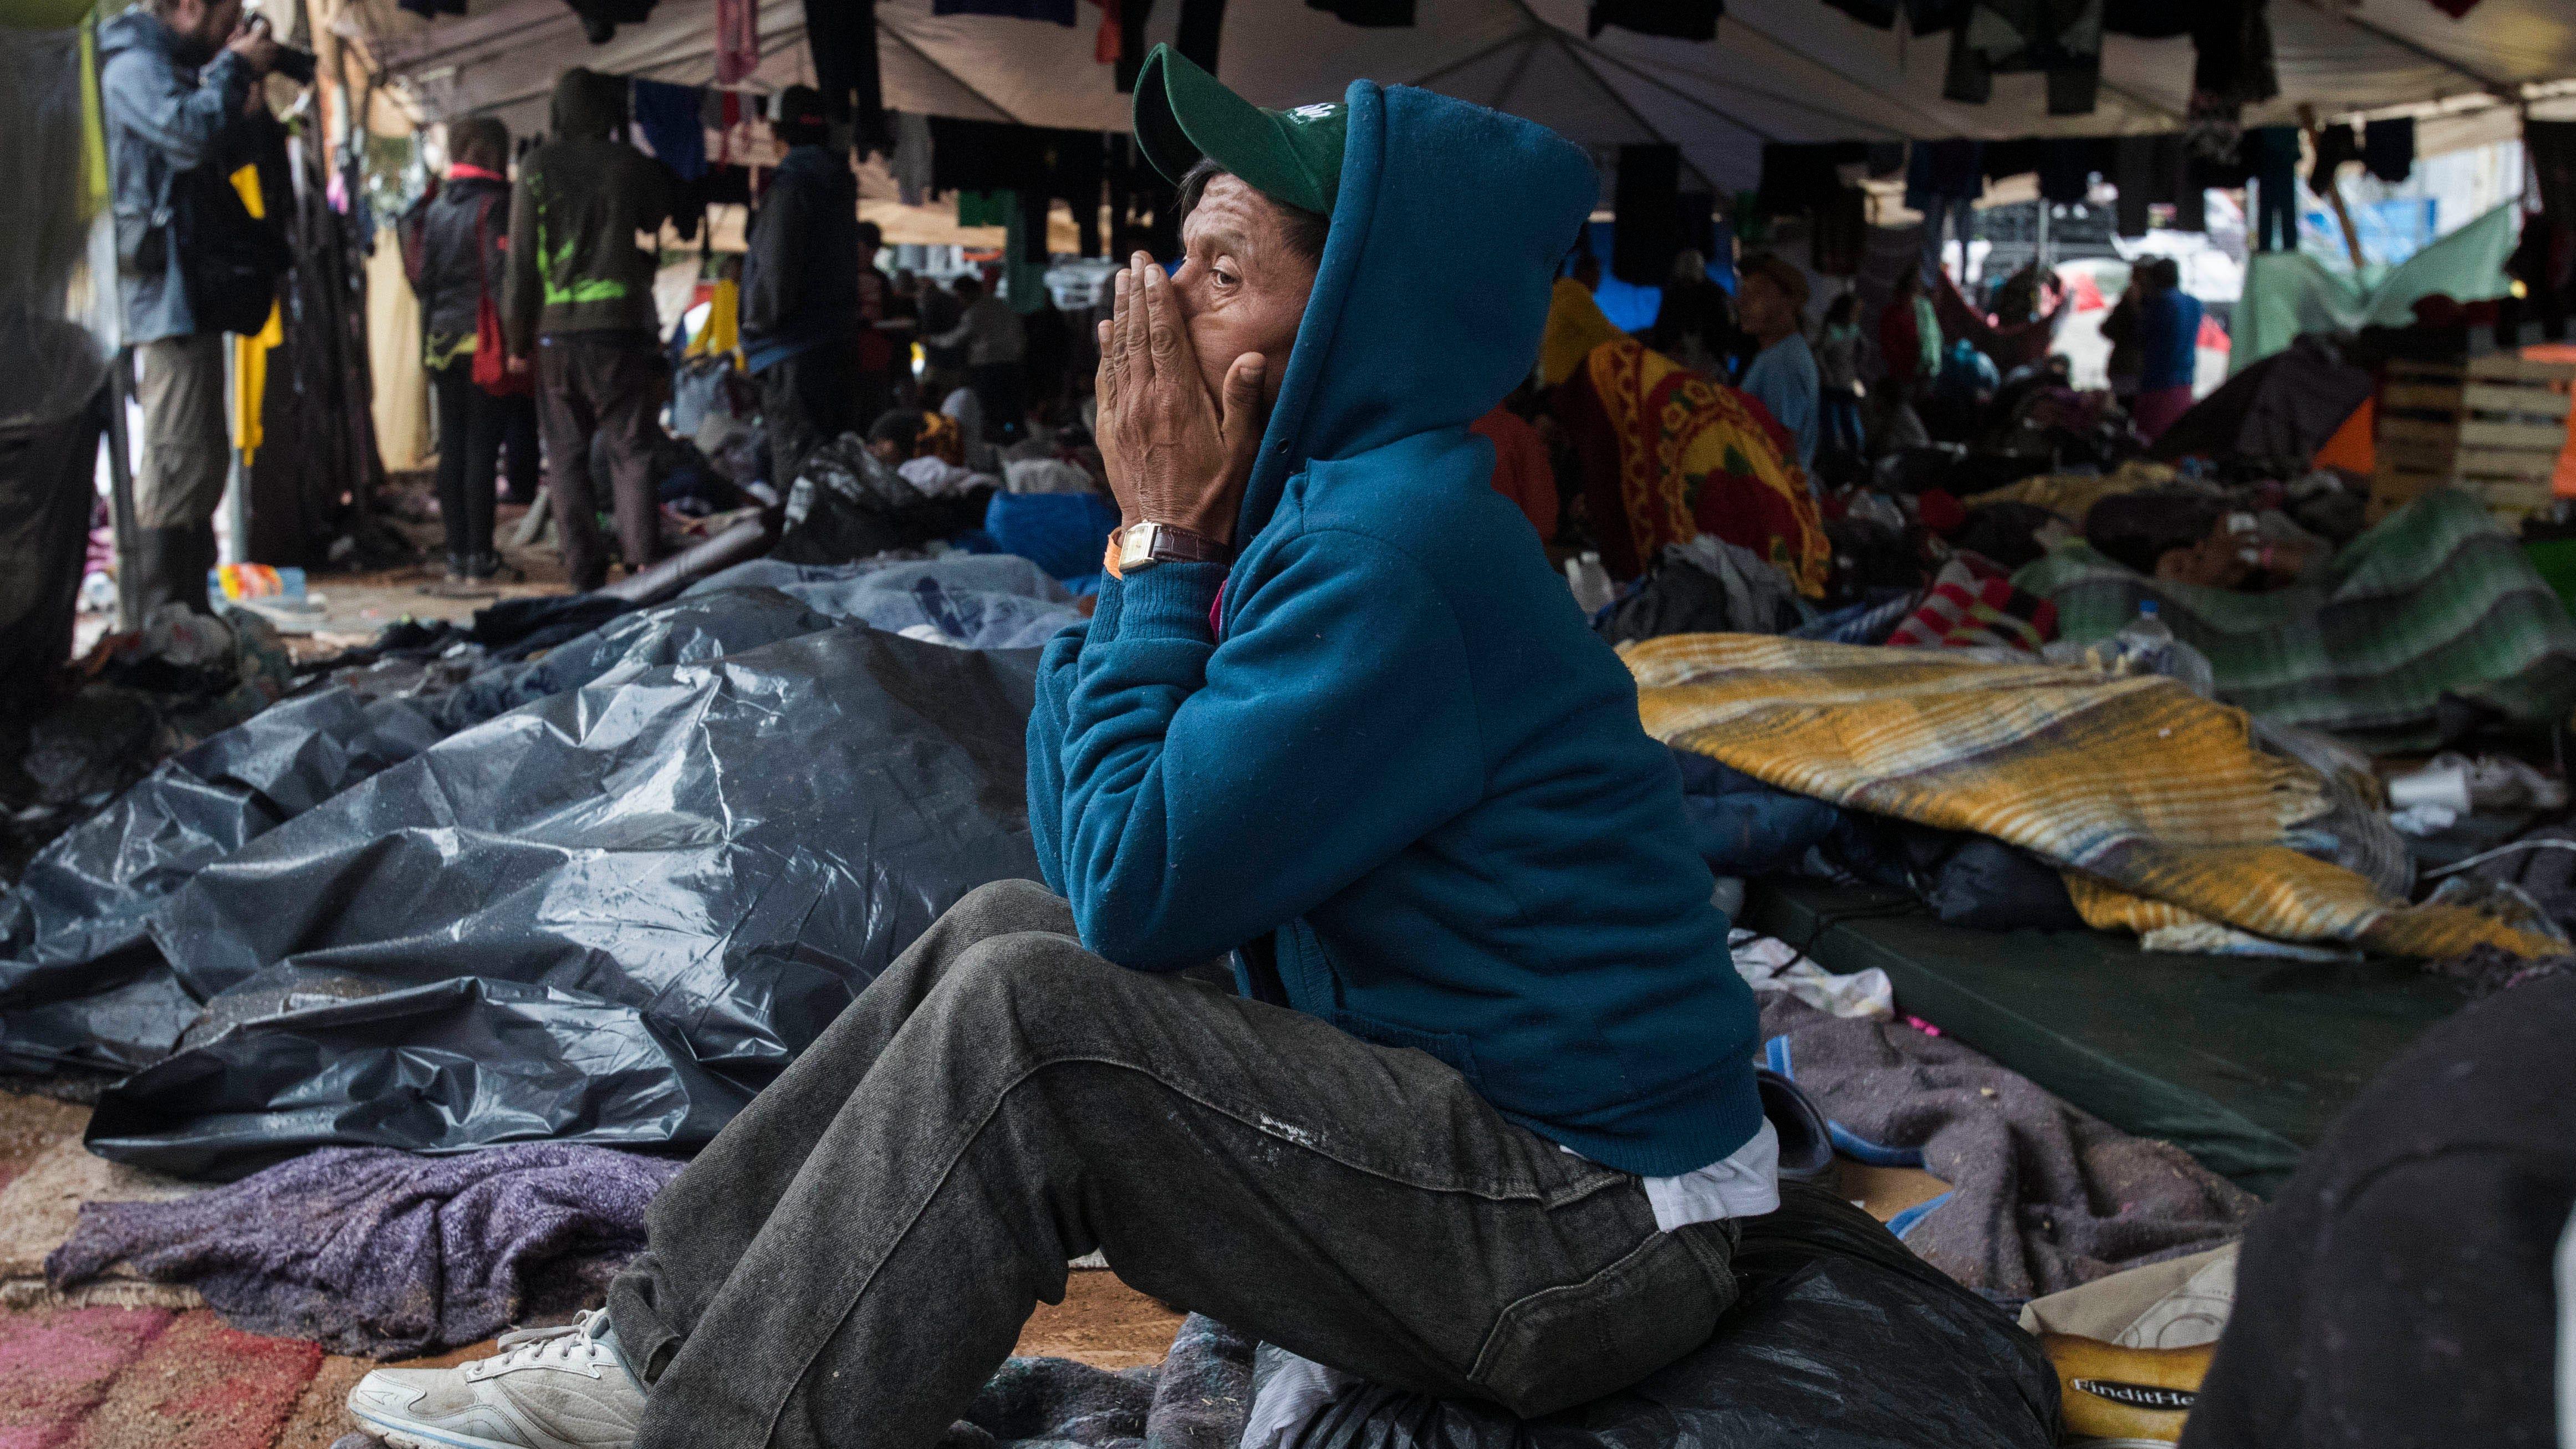 A migrant man from El Salvador contemplates his situation at the Benito Juarez sports complex in Tijuana, Mexico on Nov. 29, 2018.